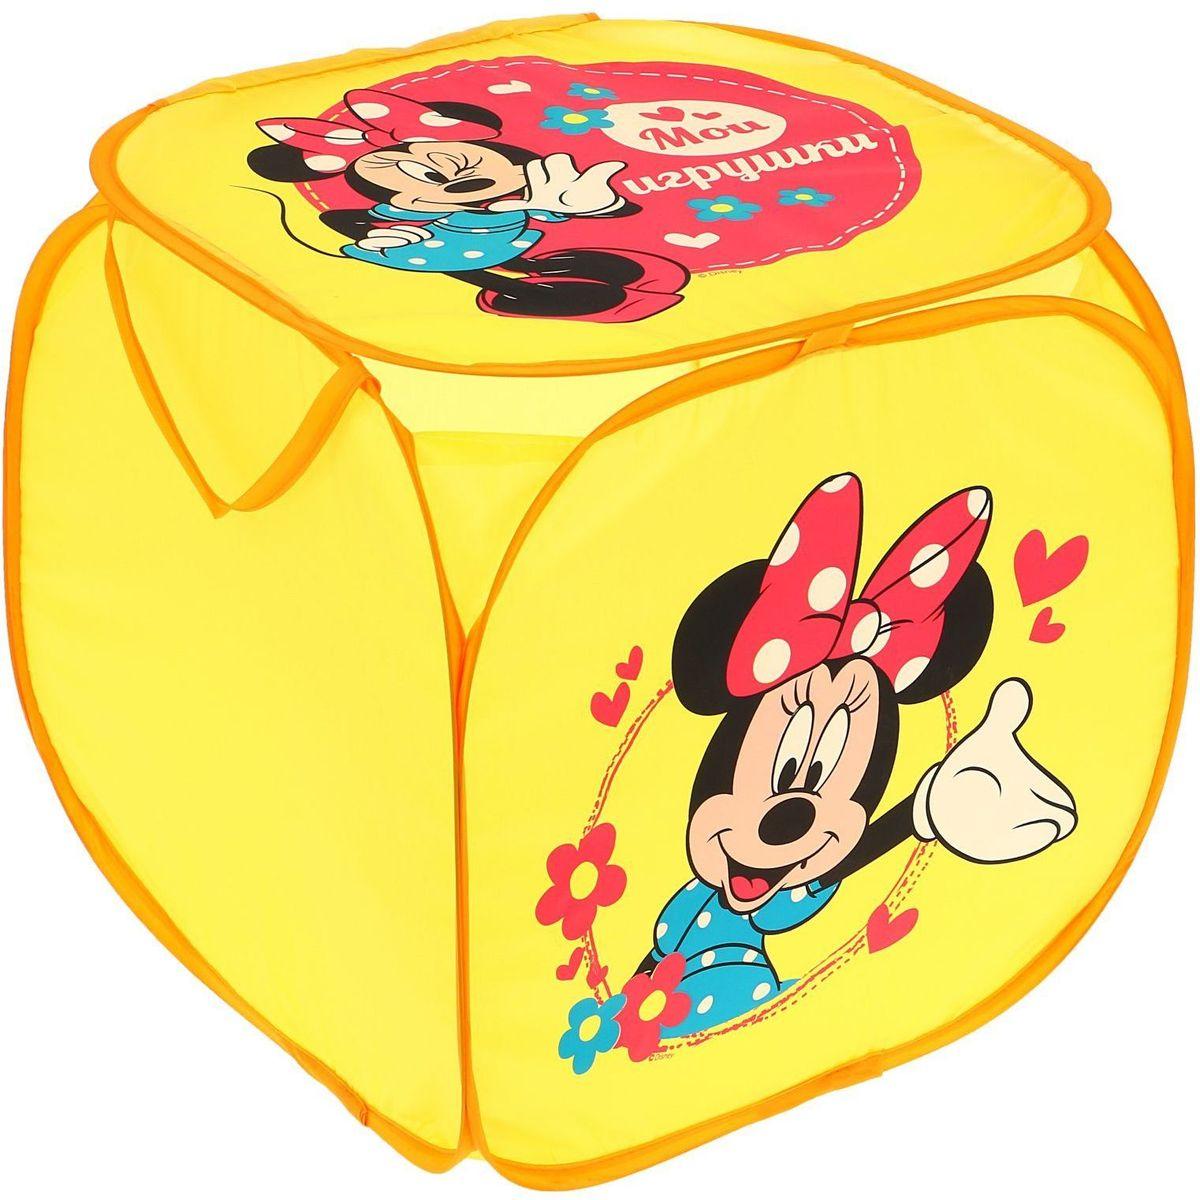 Disney Корзина для хранения Мои игрушки Минни Маус с с спандарян с с спандарян статьи письма документы